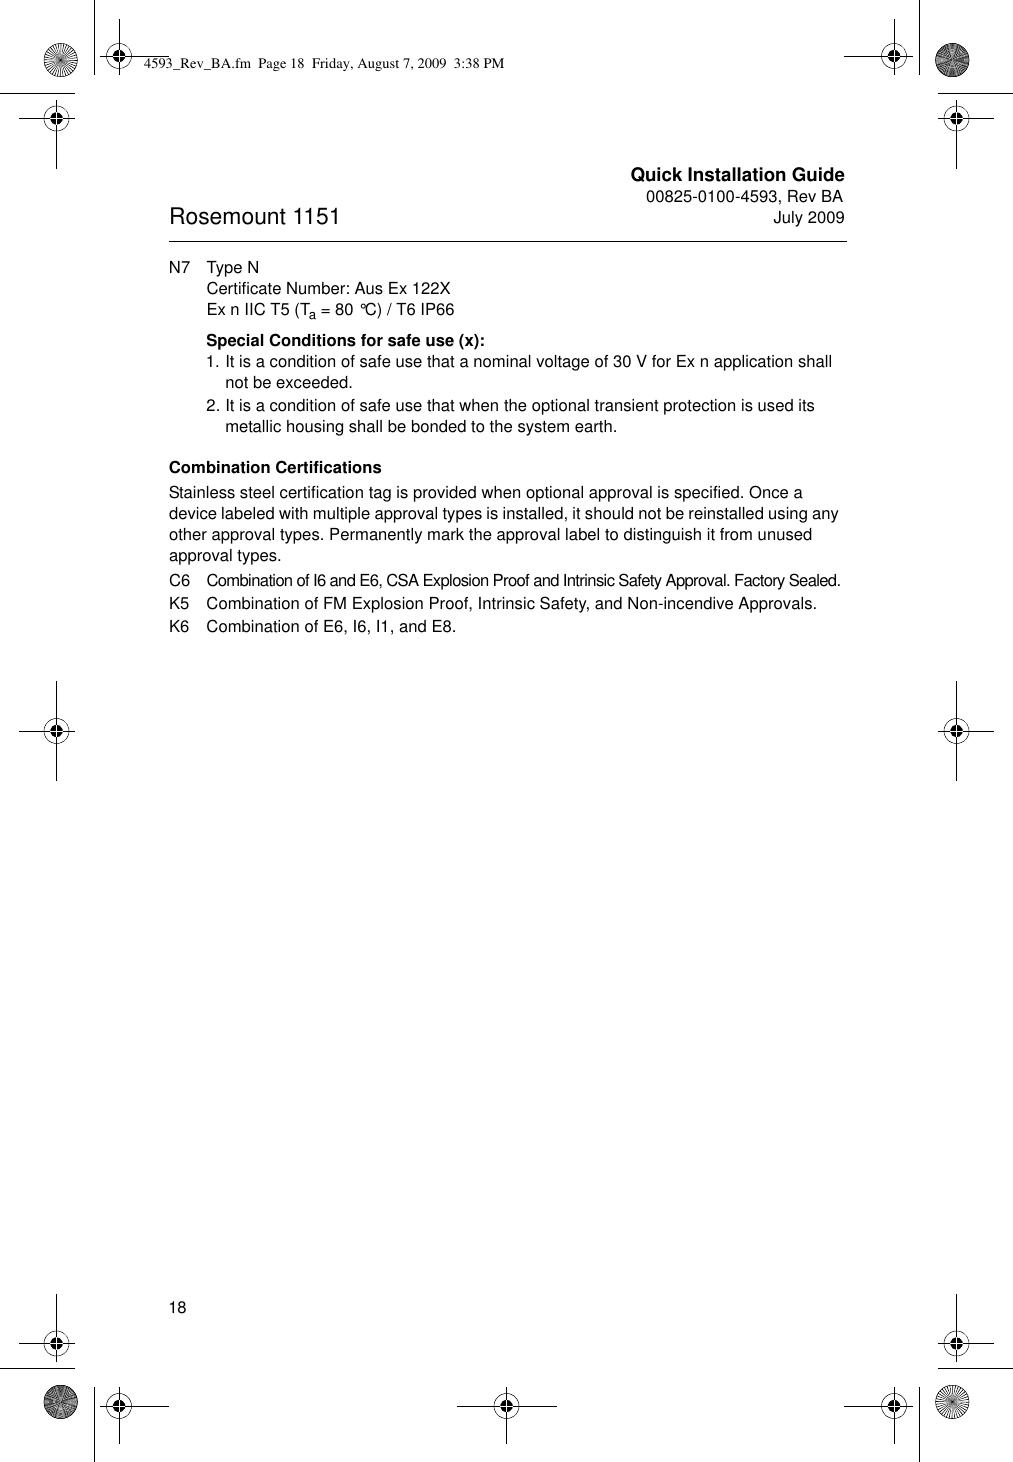 Emerson Rosemount 1151 Pressure Transmitter Users Manual With 4 20 on barrett wiring diagram, harmony wiring diagram, fairmont wiring diagram, wadena wiring diagram, regal wiring diagram, walker wiring diagram, becker wiring diagram, ramsey wiring diagram,